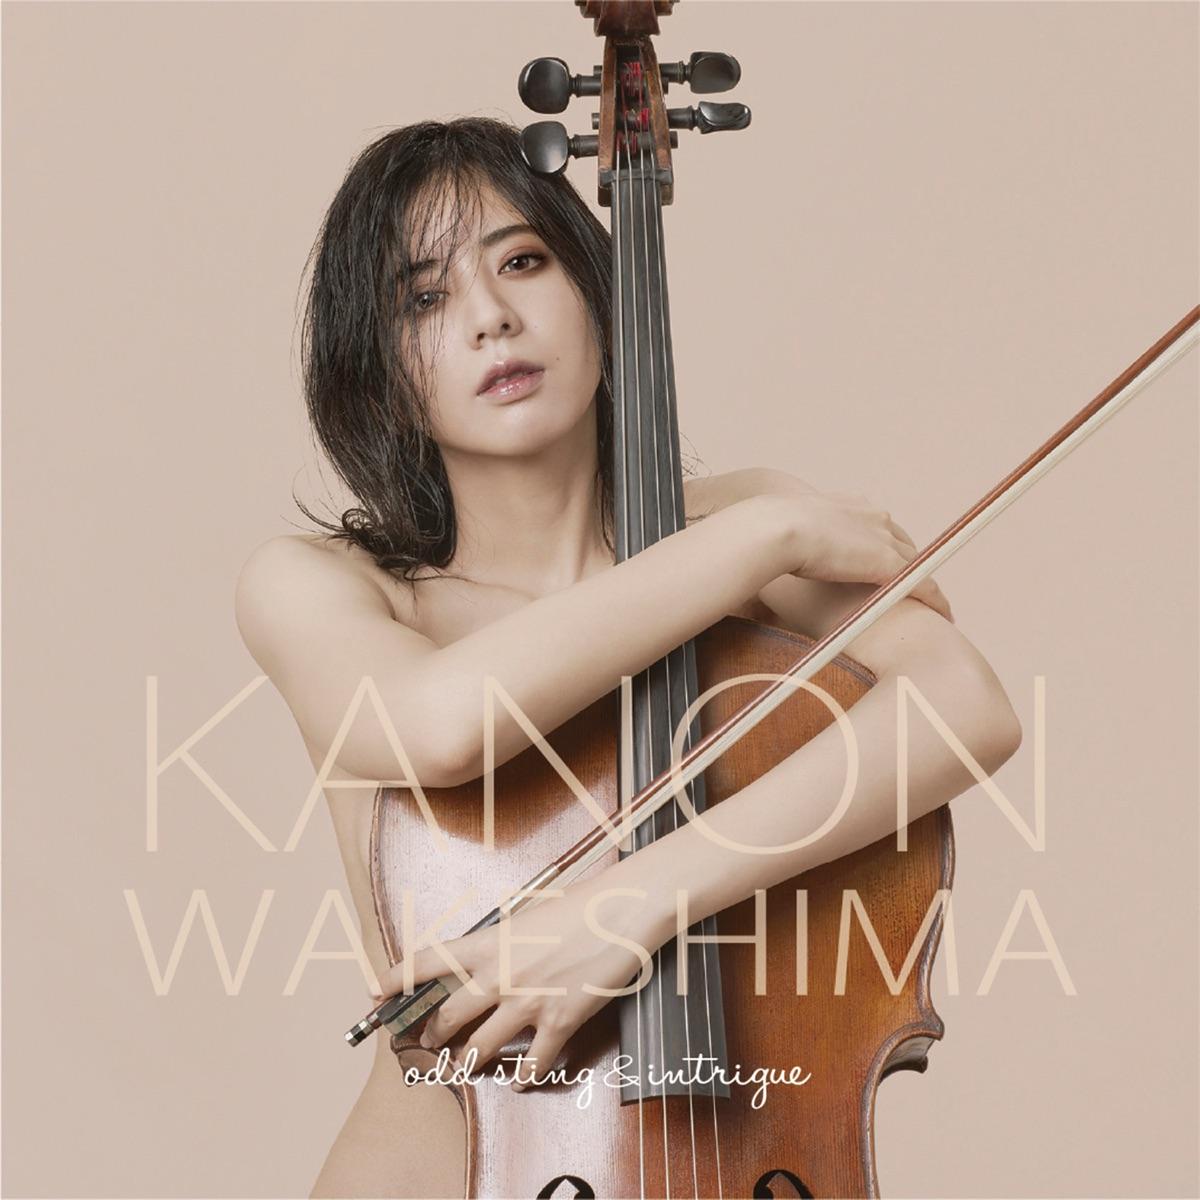 Image of Kanon Wakeshima - odd sting & intrigue